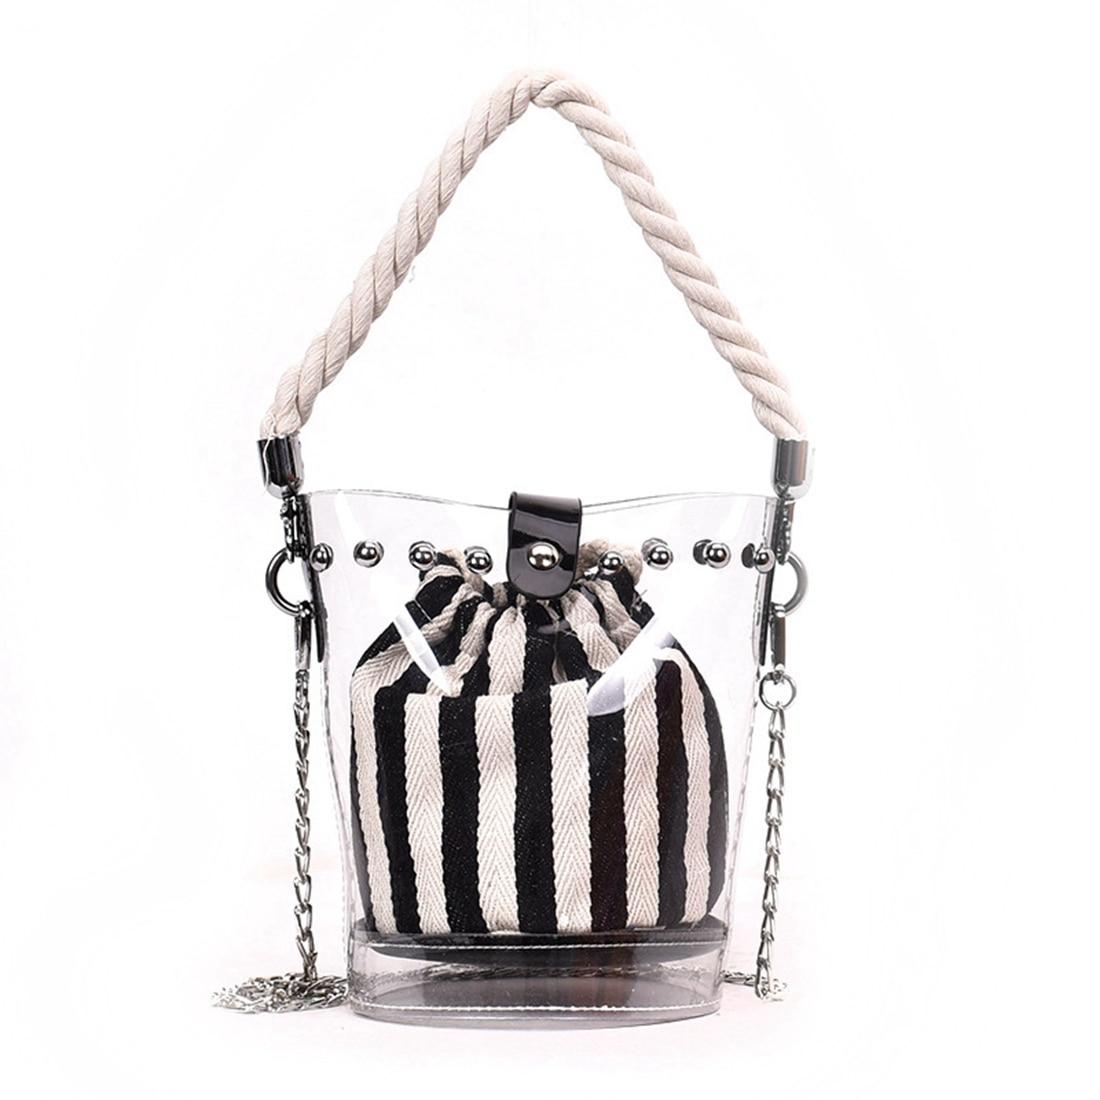 HCH-Black New Fashion PVC Chain Diagonal Bag Fashion Transparent Hit color Stripe Rivet Hemp Single shoulder Diagonal Child ba